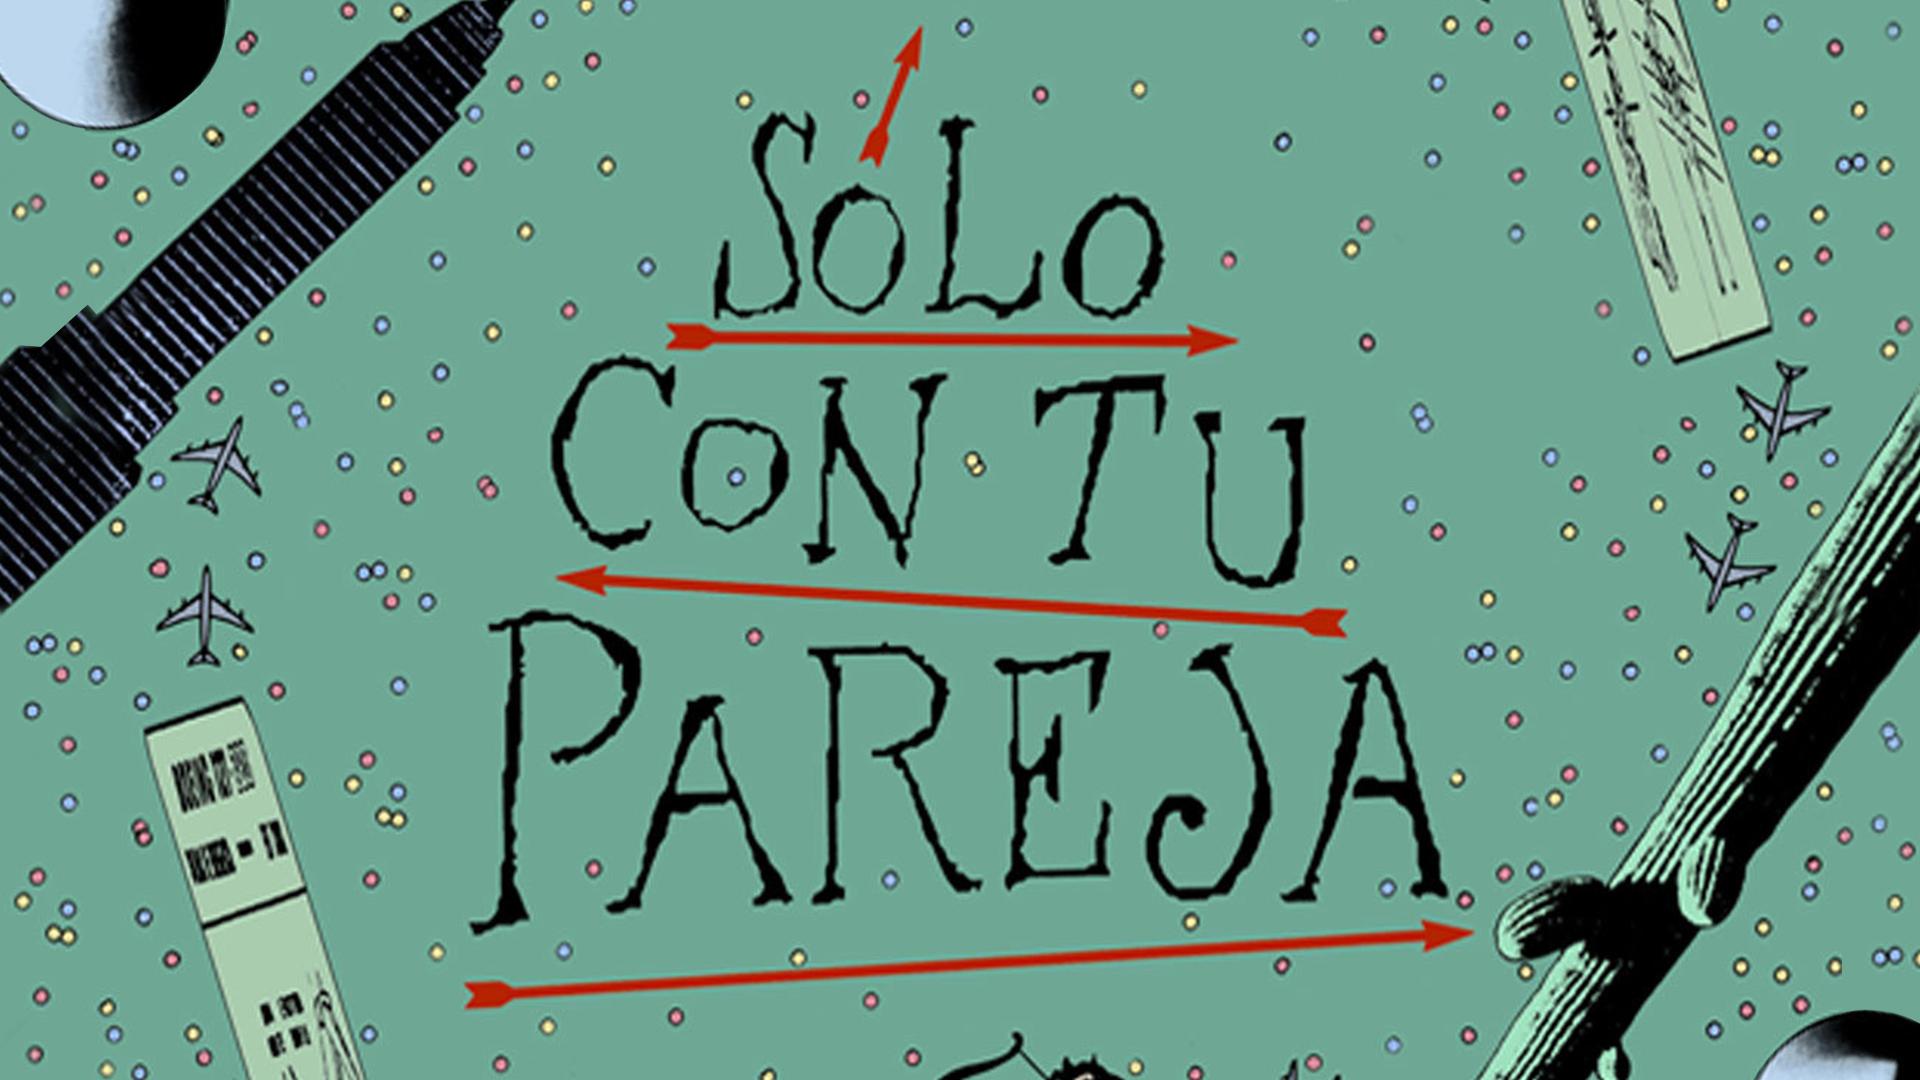 Solo Con Tu Pareja (English Subtitled)